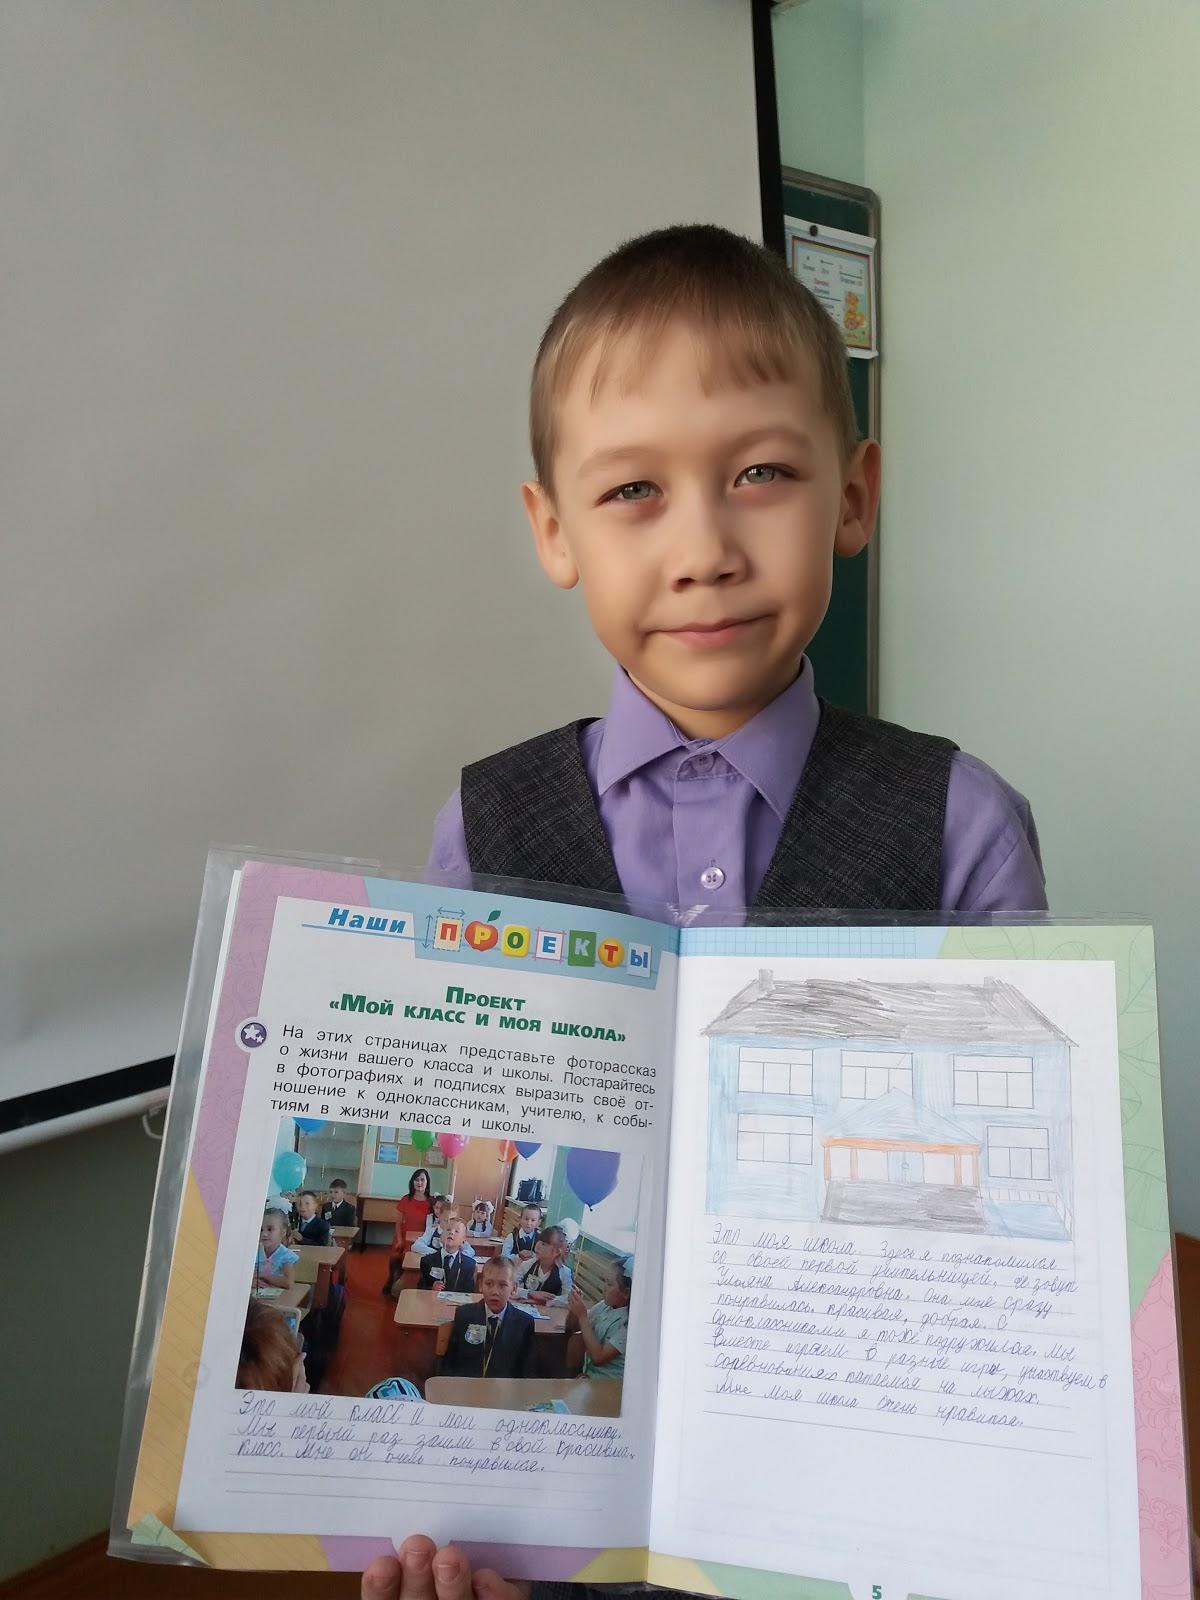 Картинки приколы мой класс и моя школа 1 класс окружающий мир